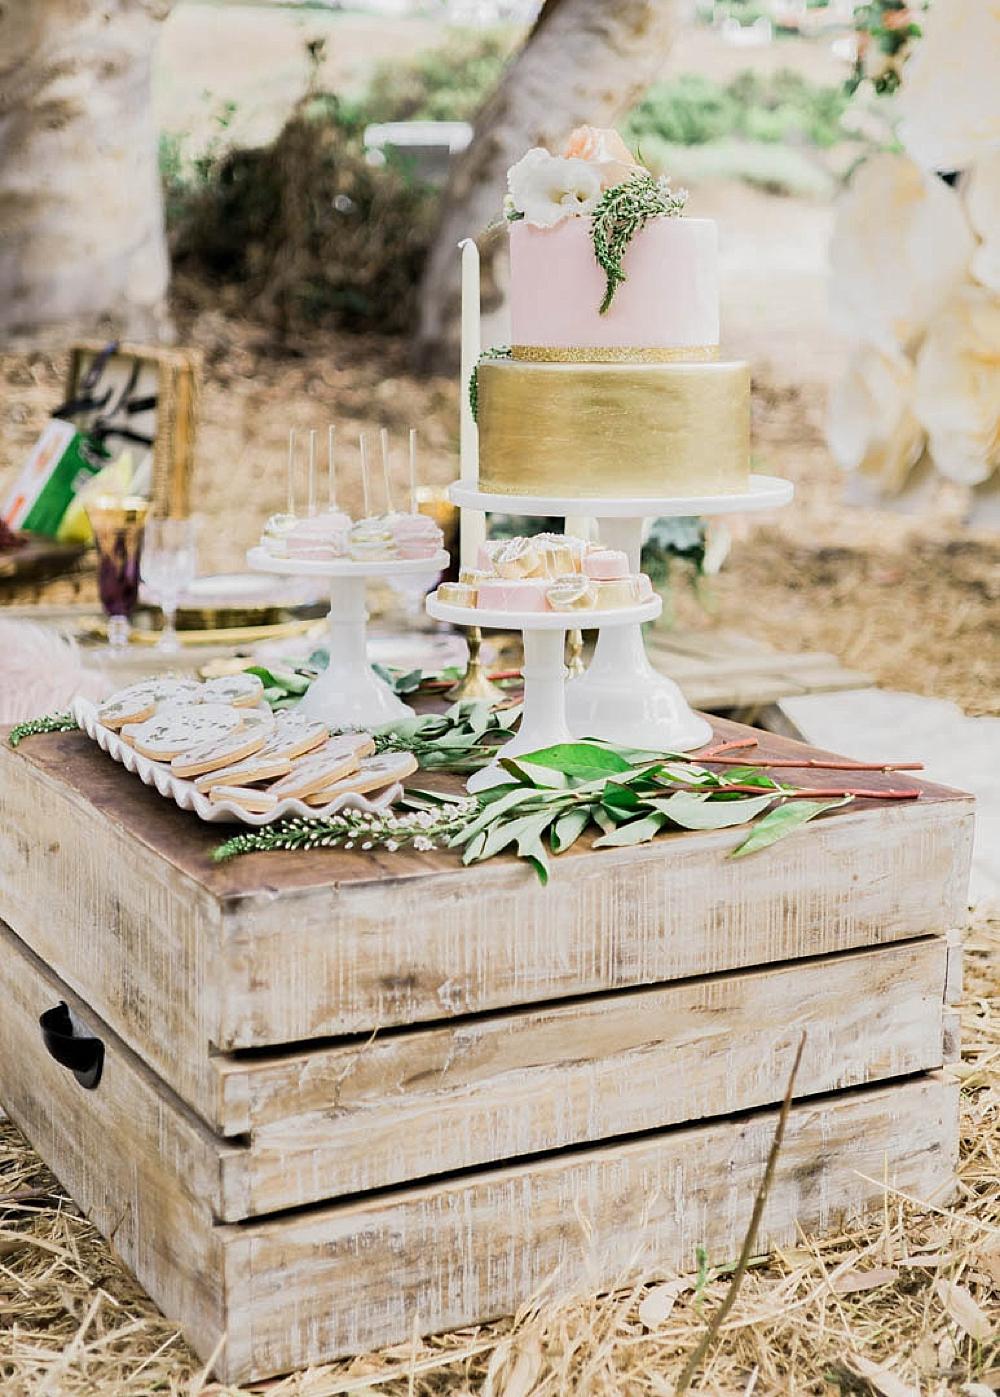 Malaga-Cove-Palos-Verdes-Engagement-Photographer-Carissa-Woo-Photography_0015.jpg